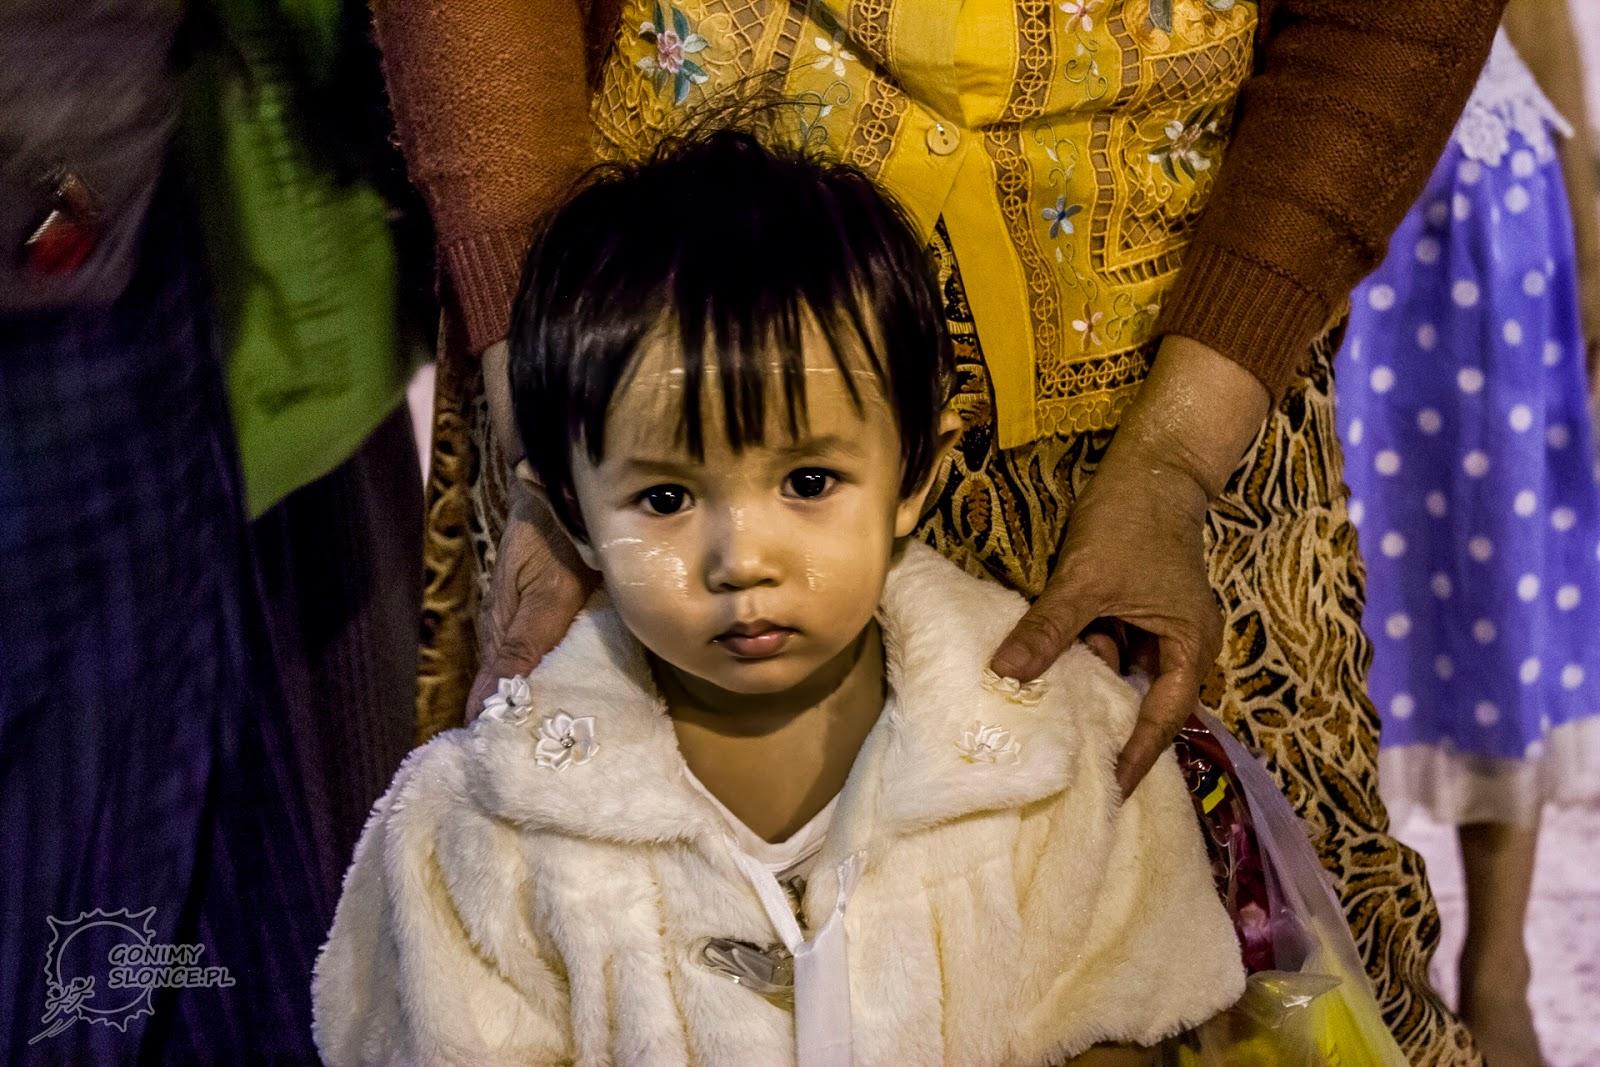 Dziecko i thanaka na twarzy, Mjanma / Birma